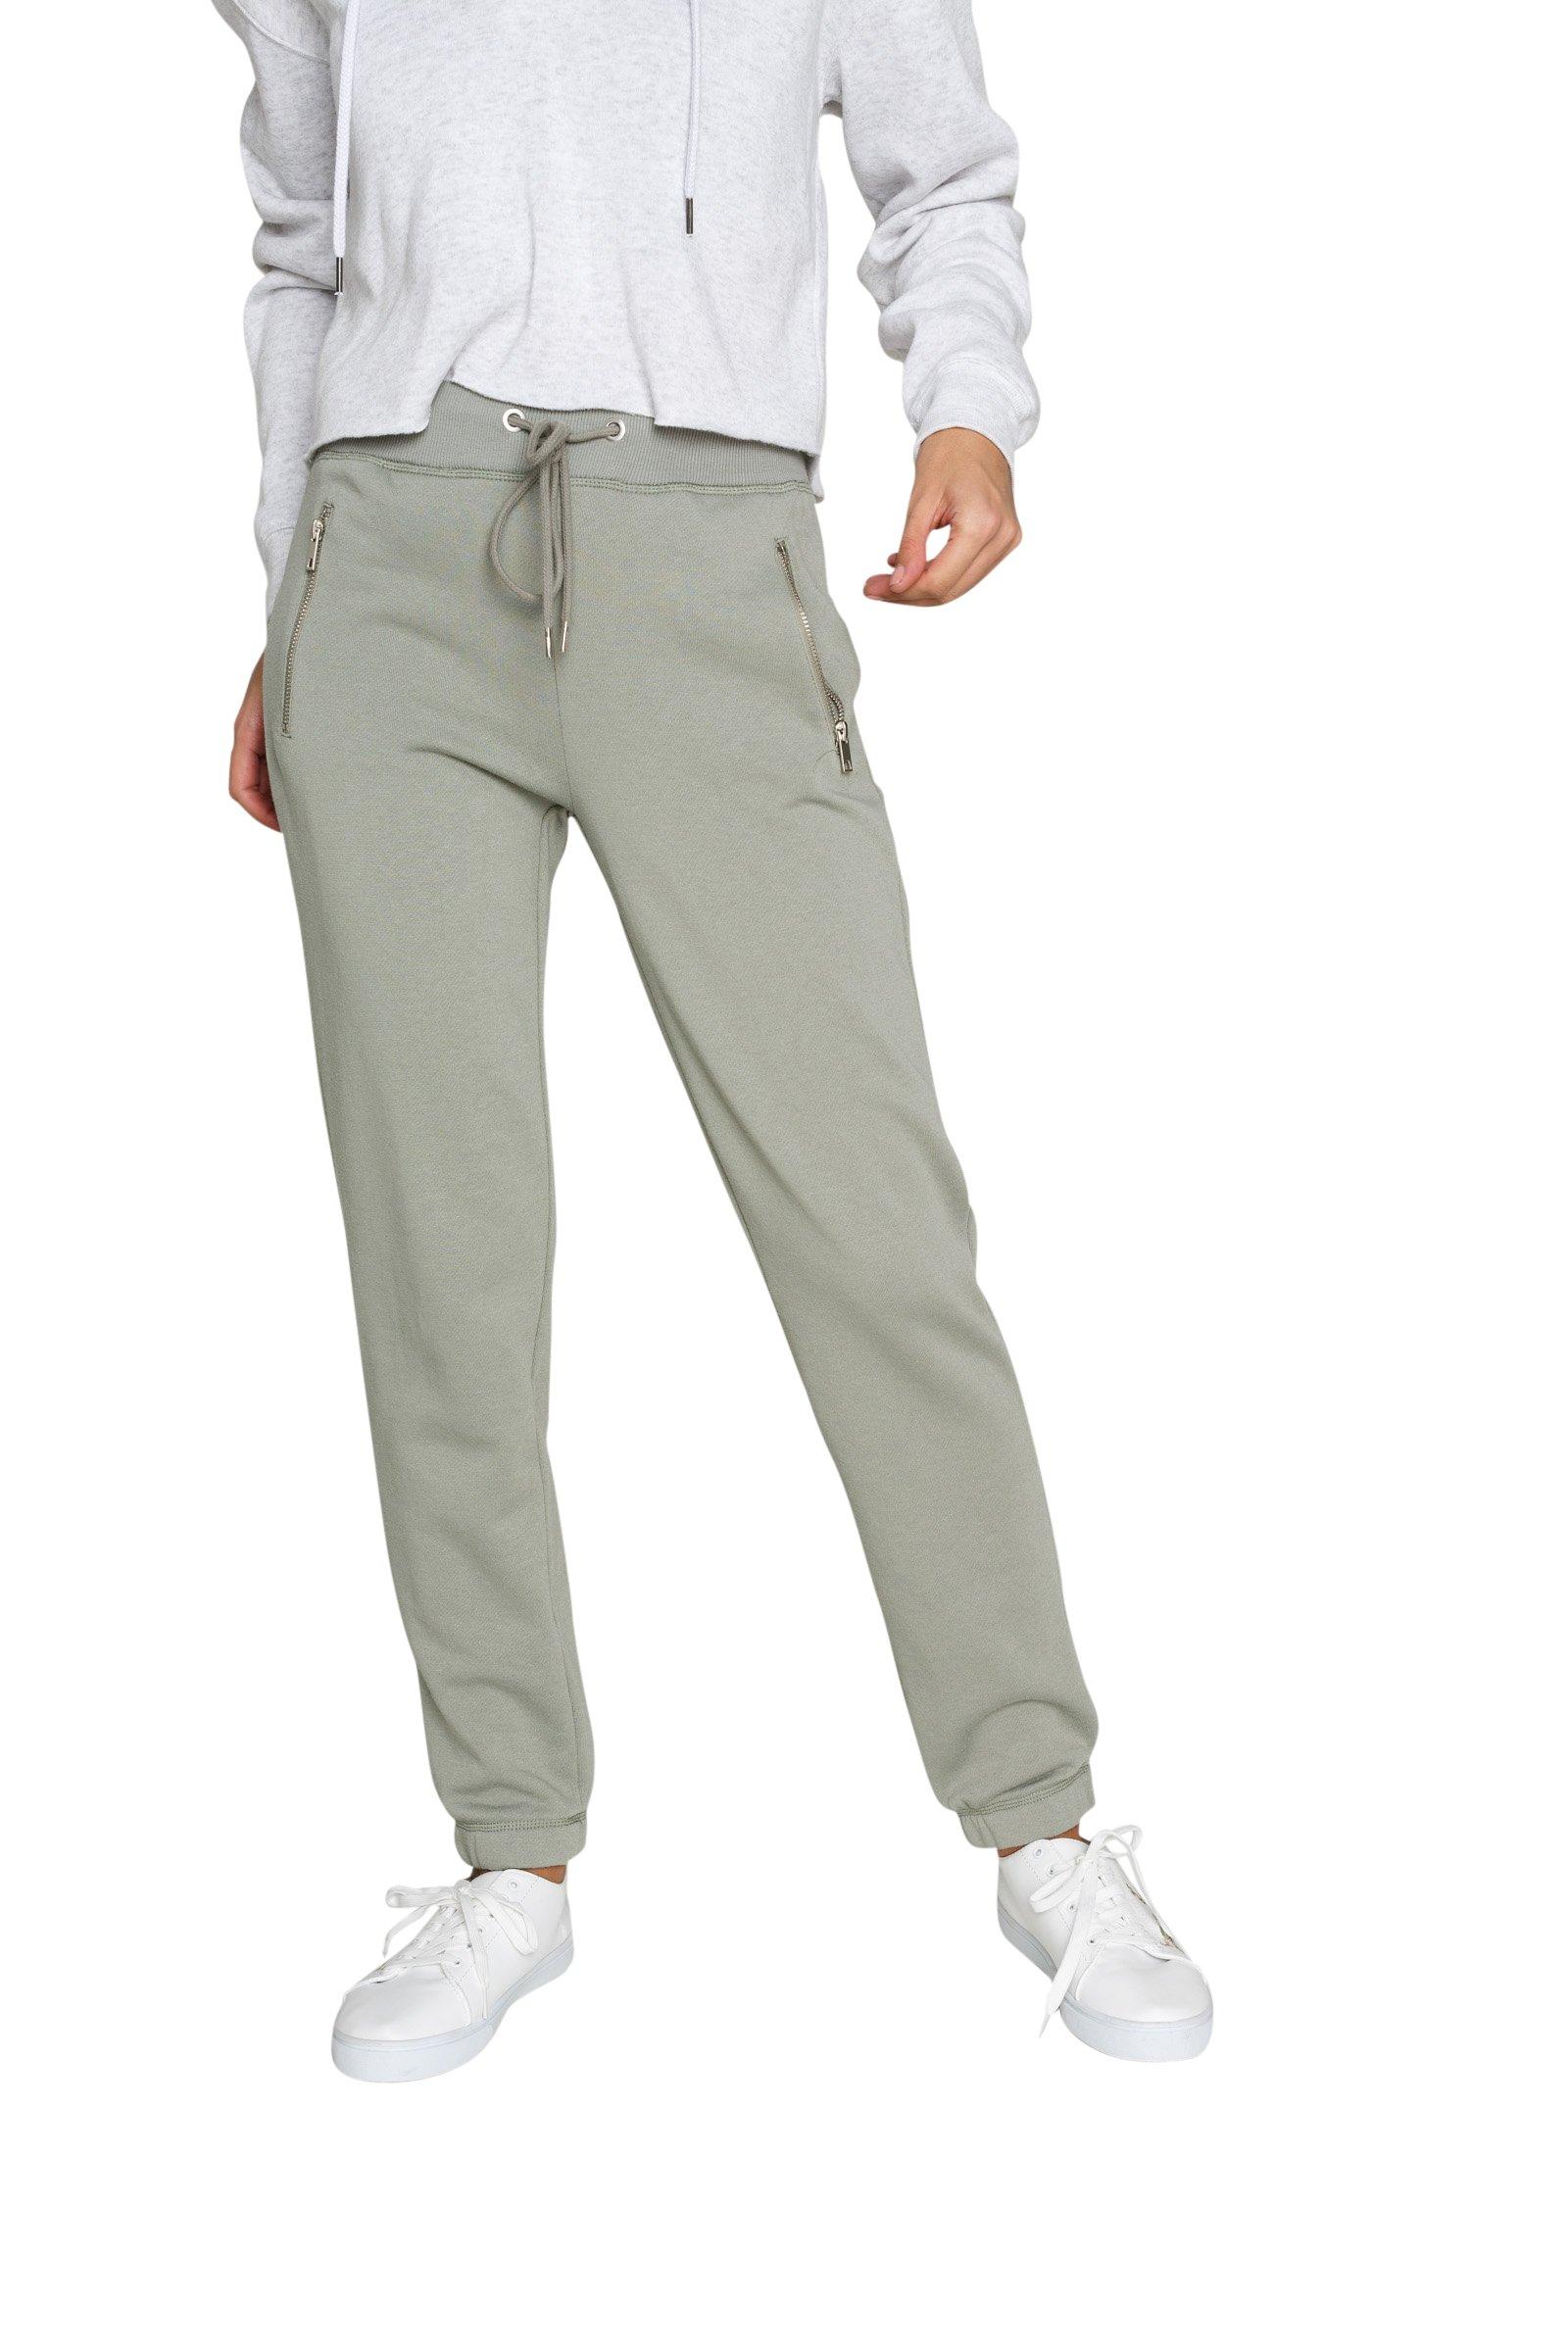 Ardene Women's - Sweatpants & Joggers - Fine Knit Sweatpants Small -(8A-AP01953)